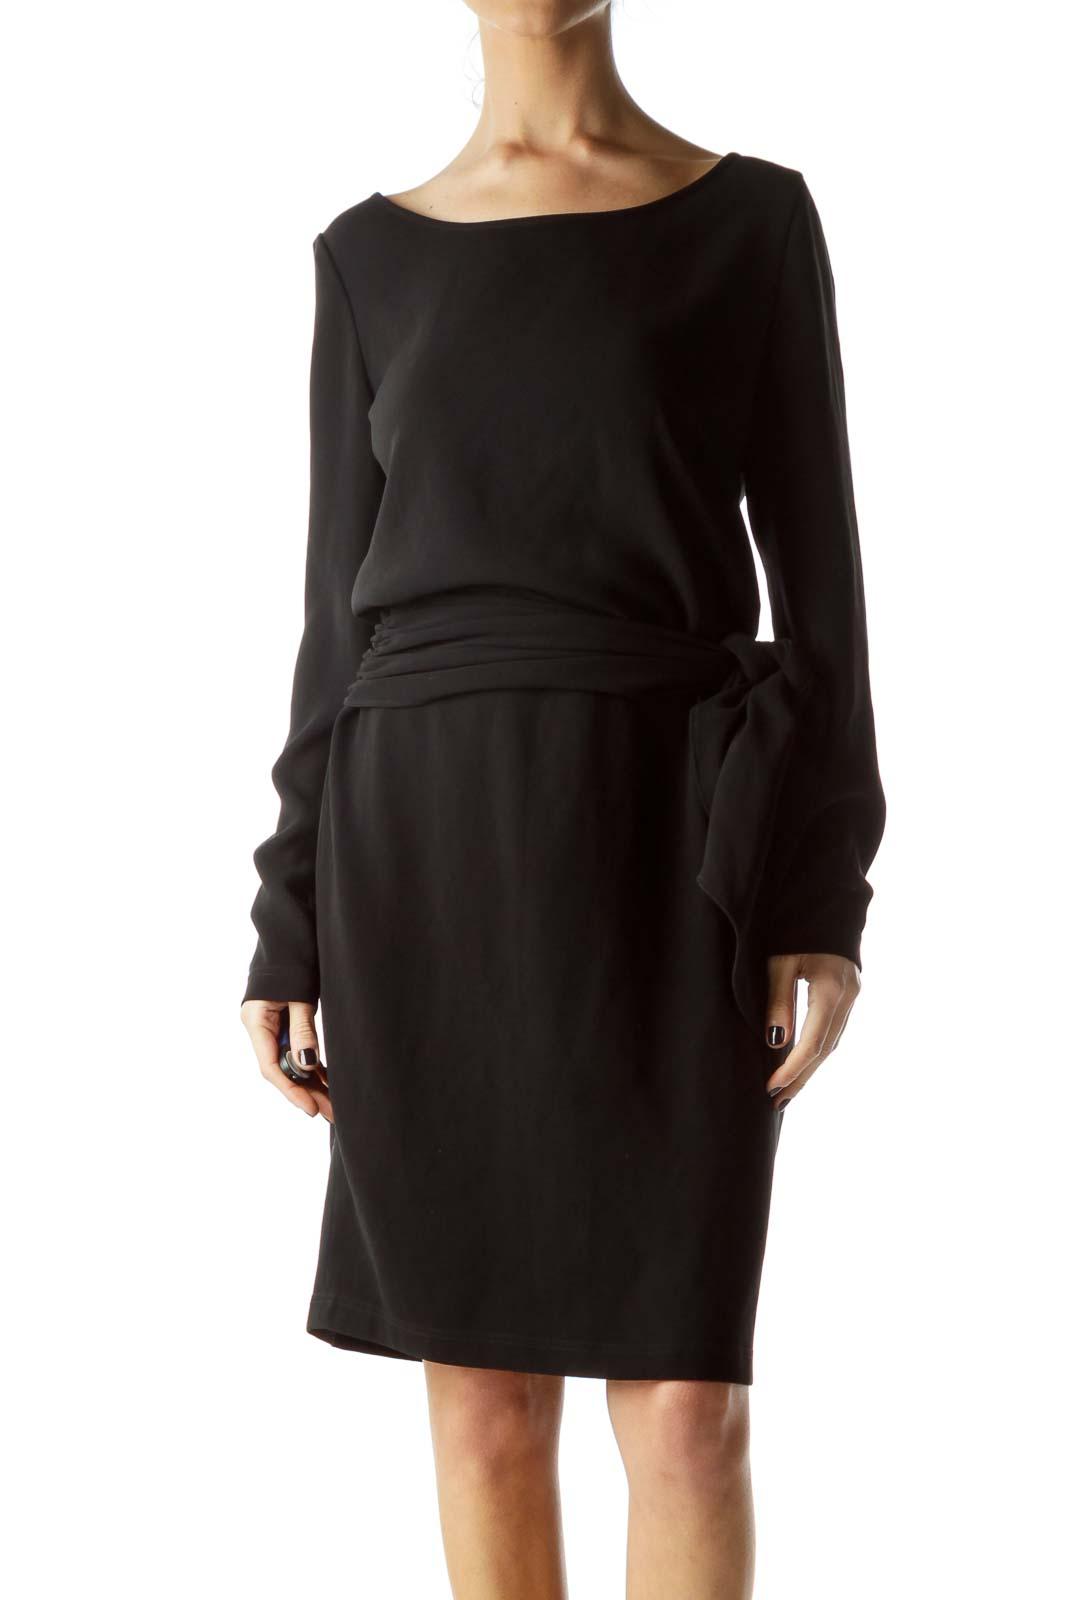 Black Round Neck Long-Sleeve Work Dress